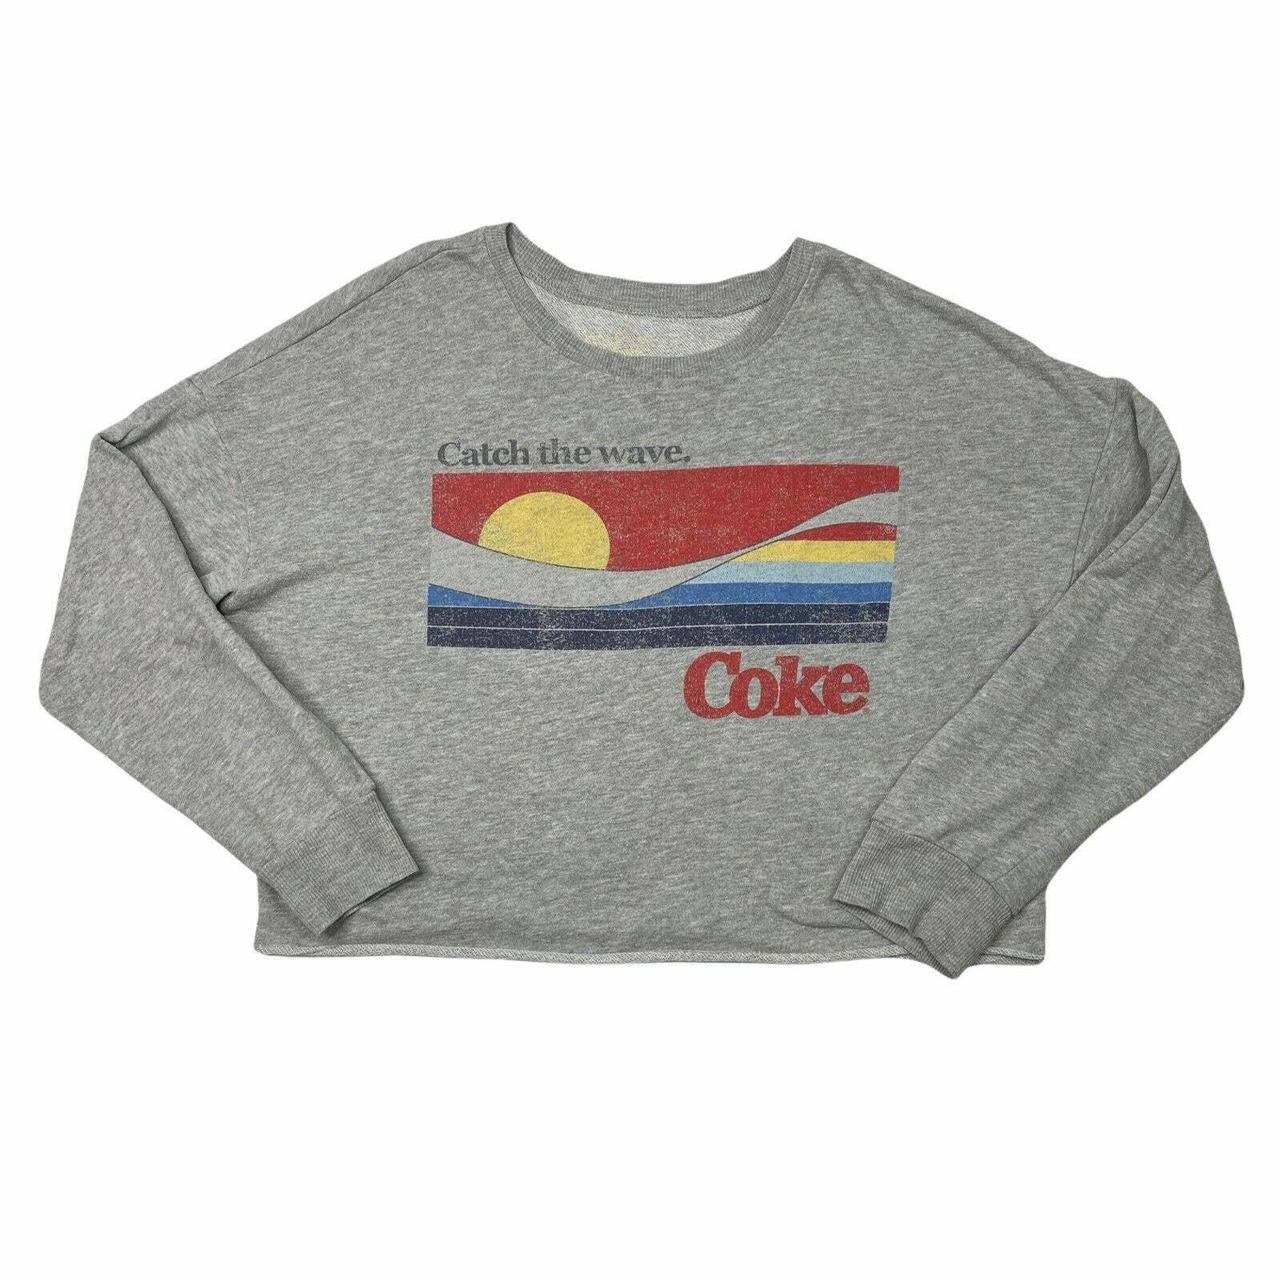 Product Image 1 - Coca Cola Official - Retro